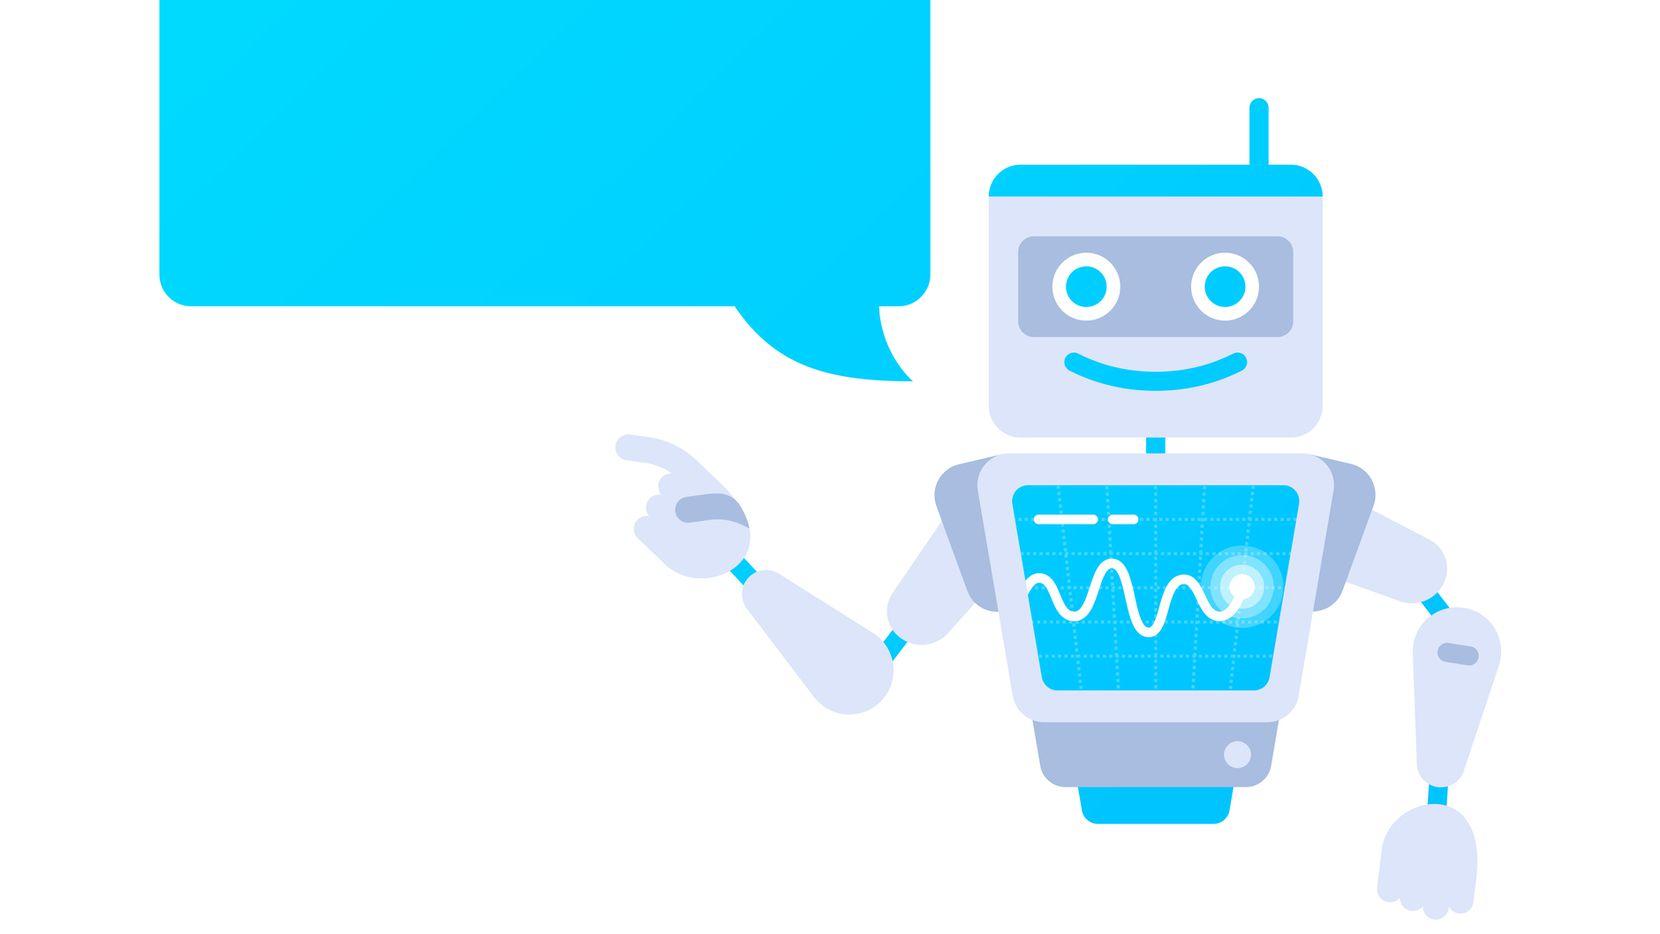 Arlington cuenta con un nuevo servicio de texto vía chatbot para responder a preguntas sobre servicios públicos o reportar bache.